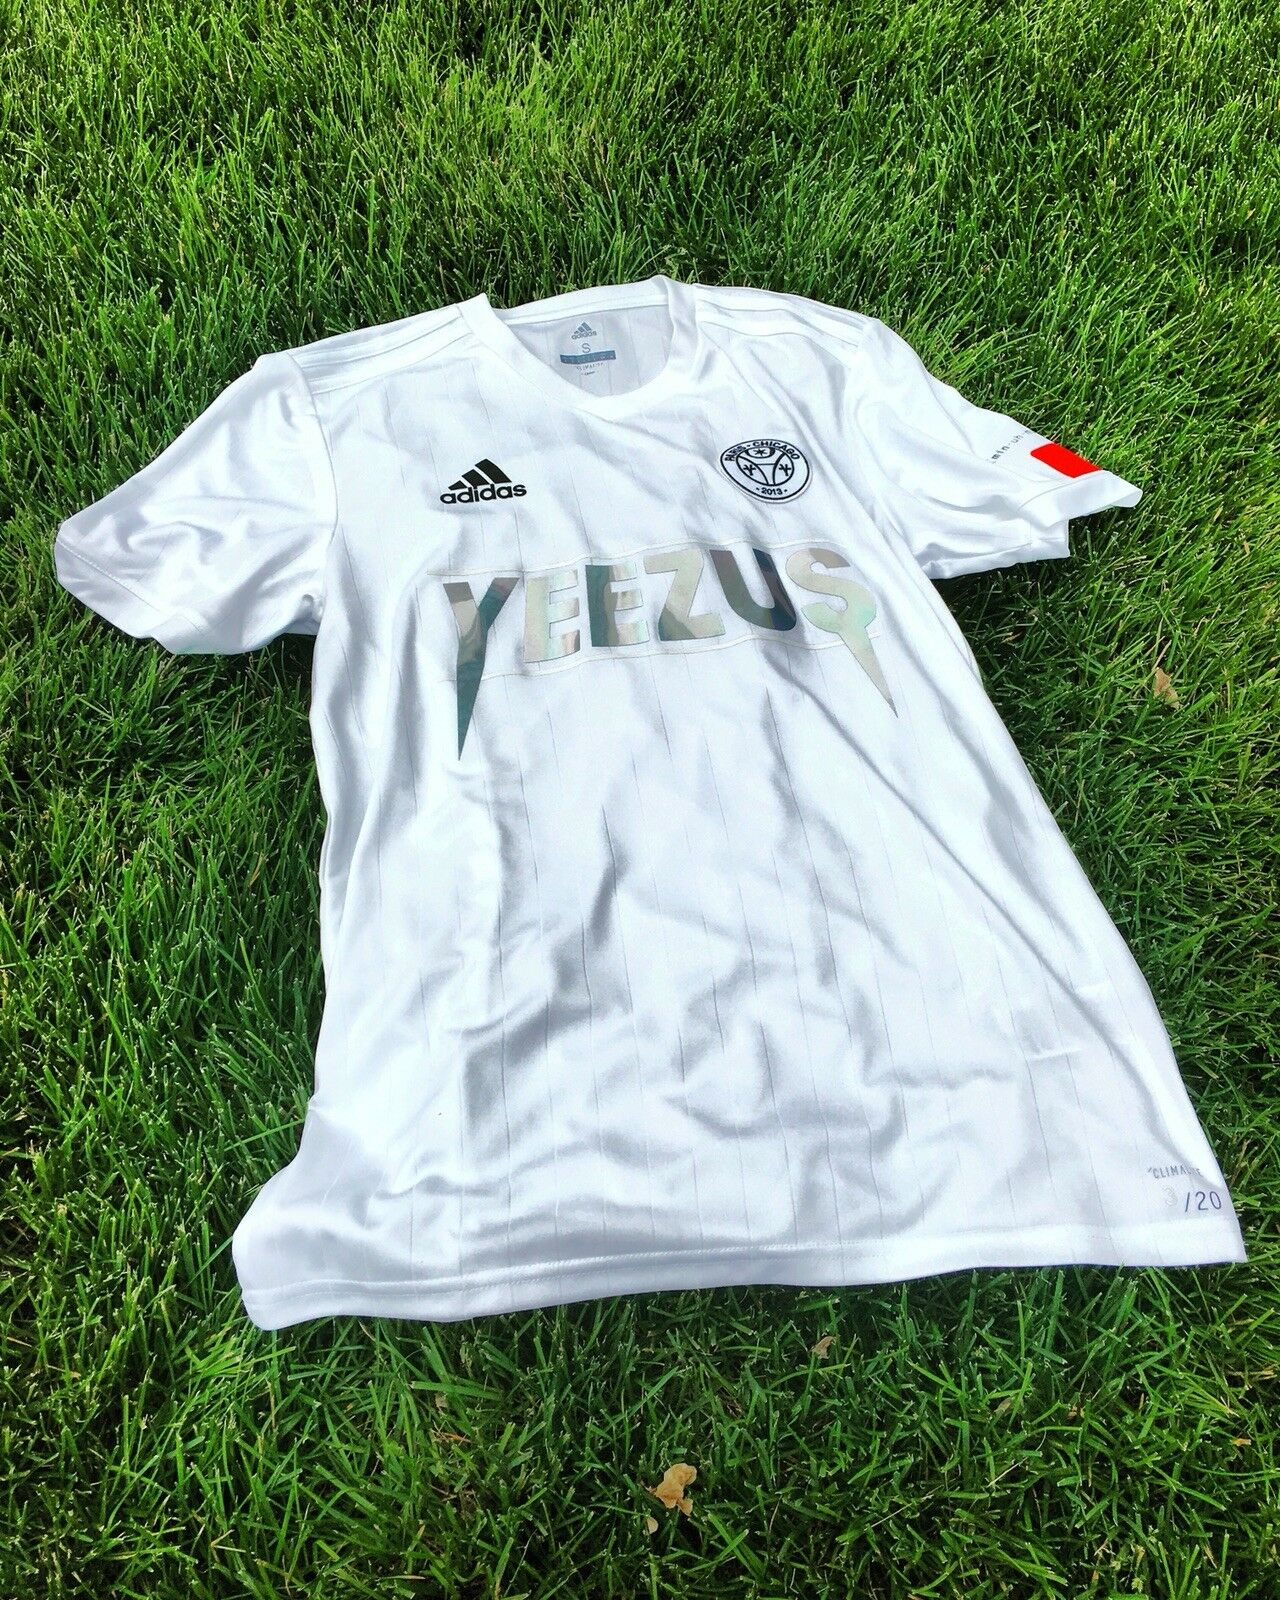 Yeezus Soccer Jersey Diuominiione Medium